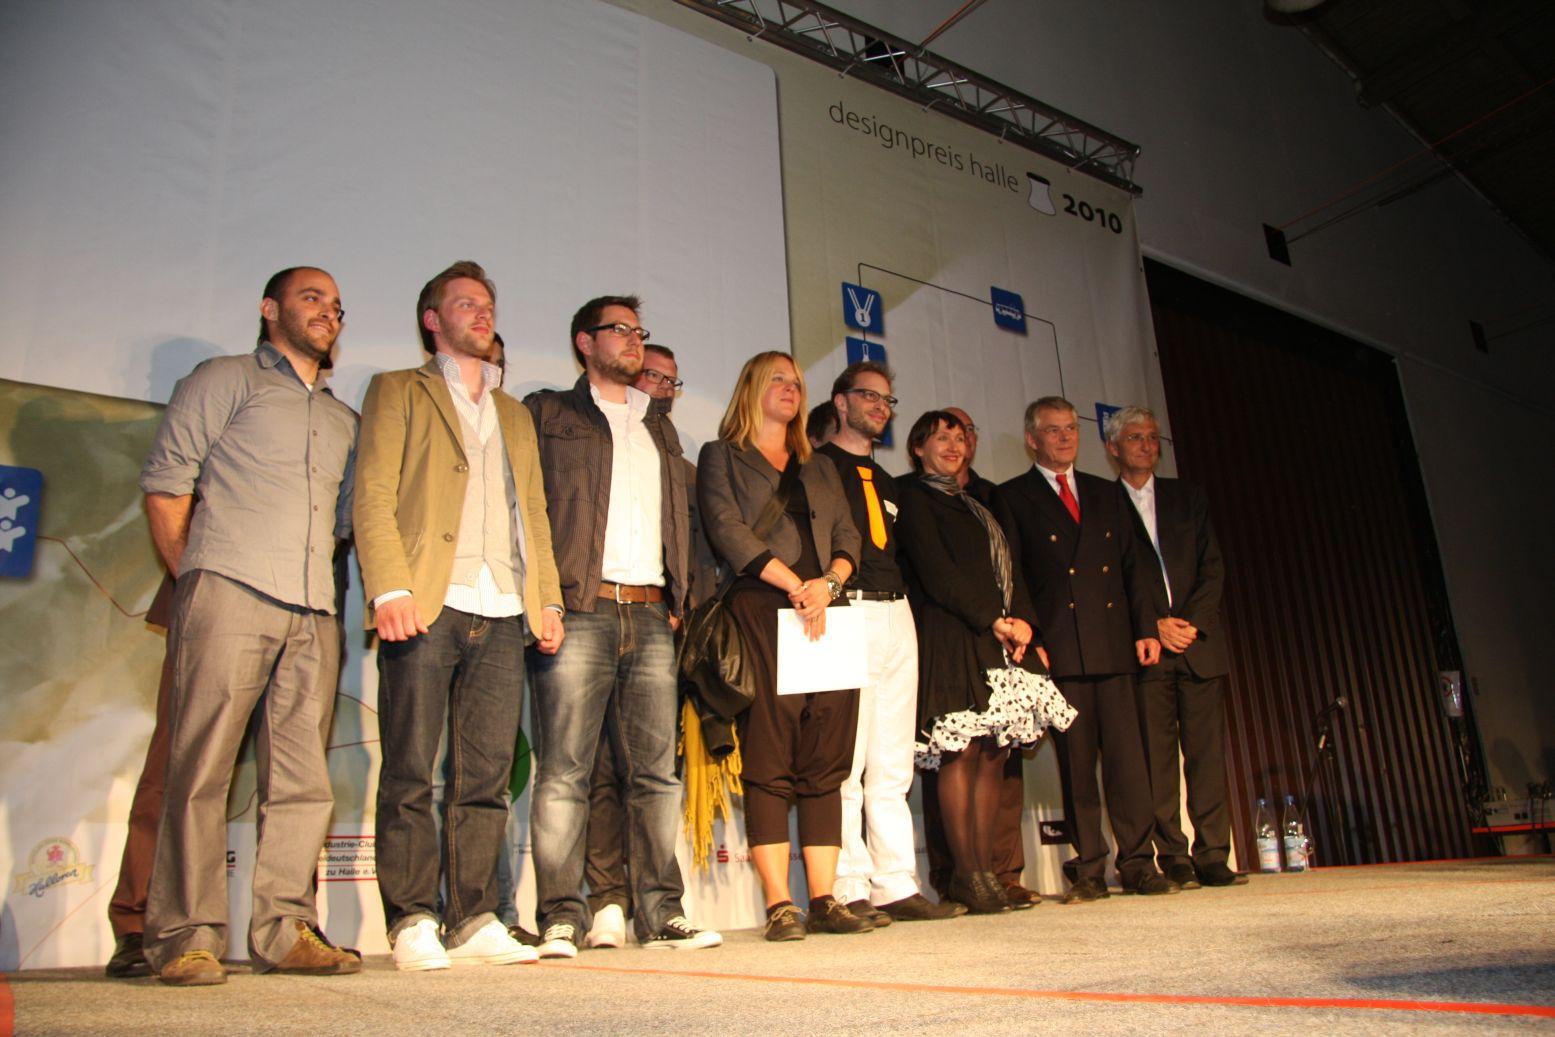 Desinpreis Halle 2010 winners - front left first prize winner